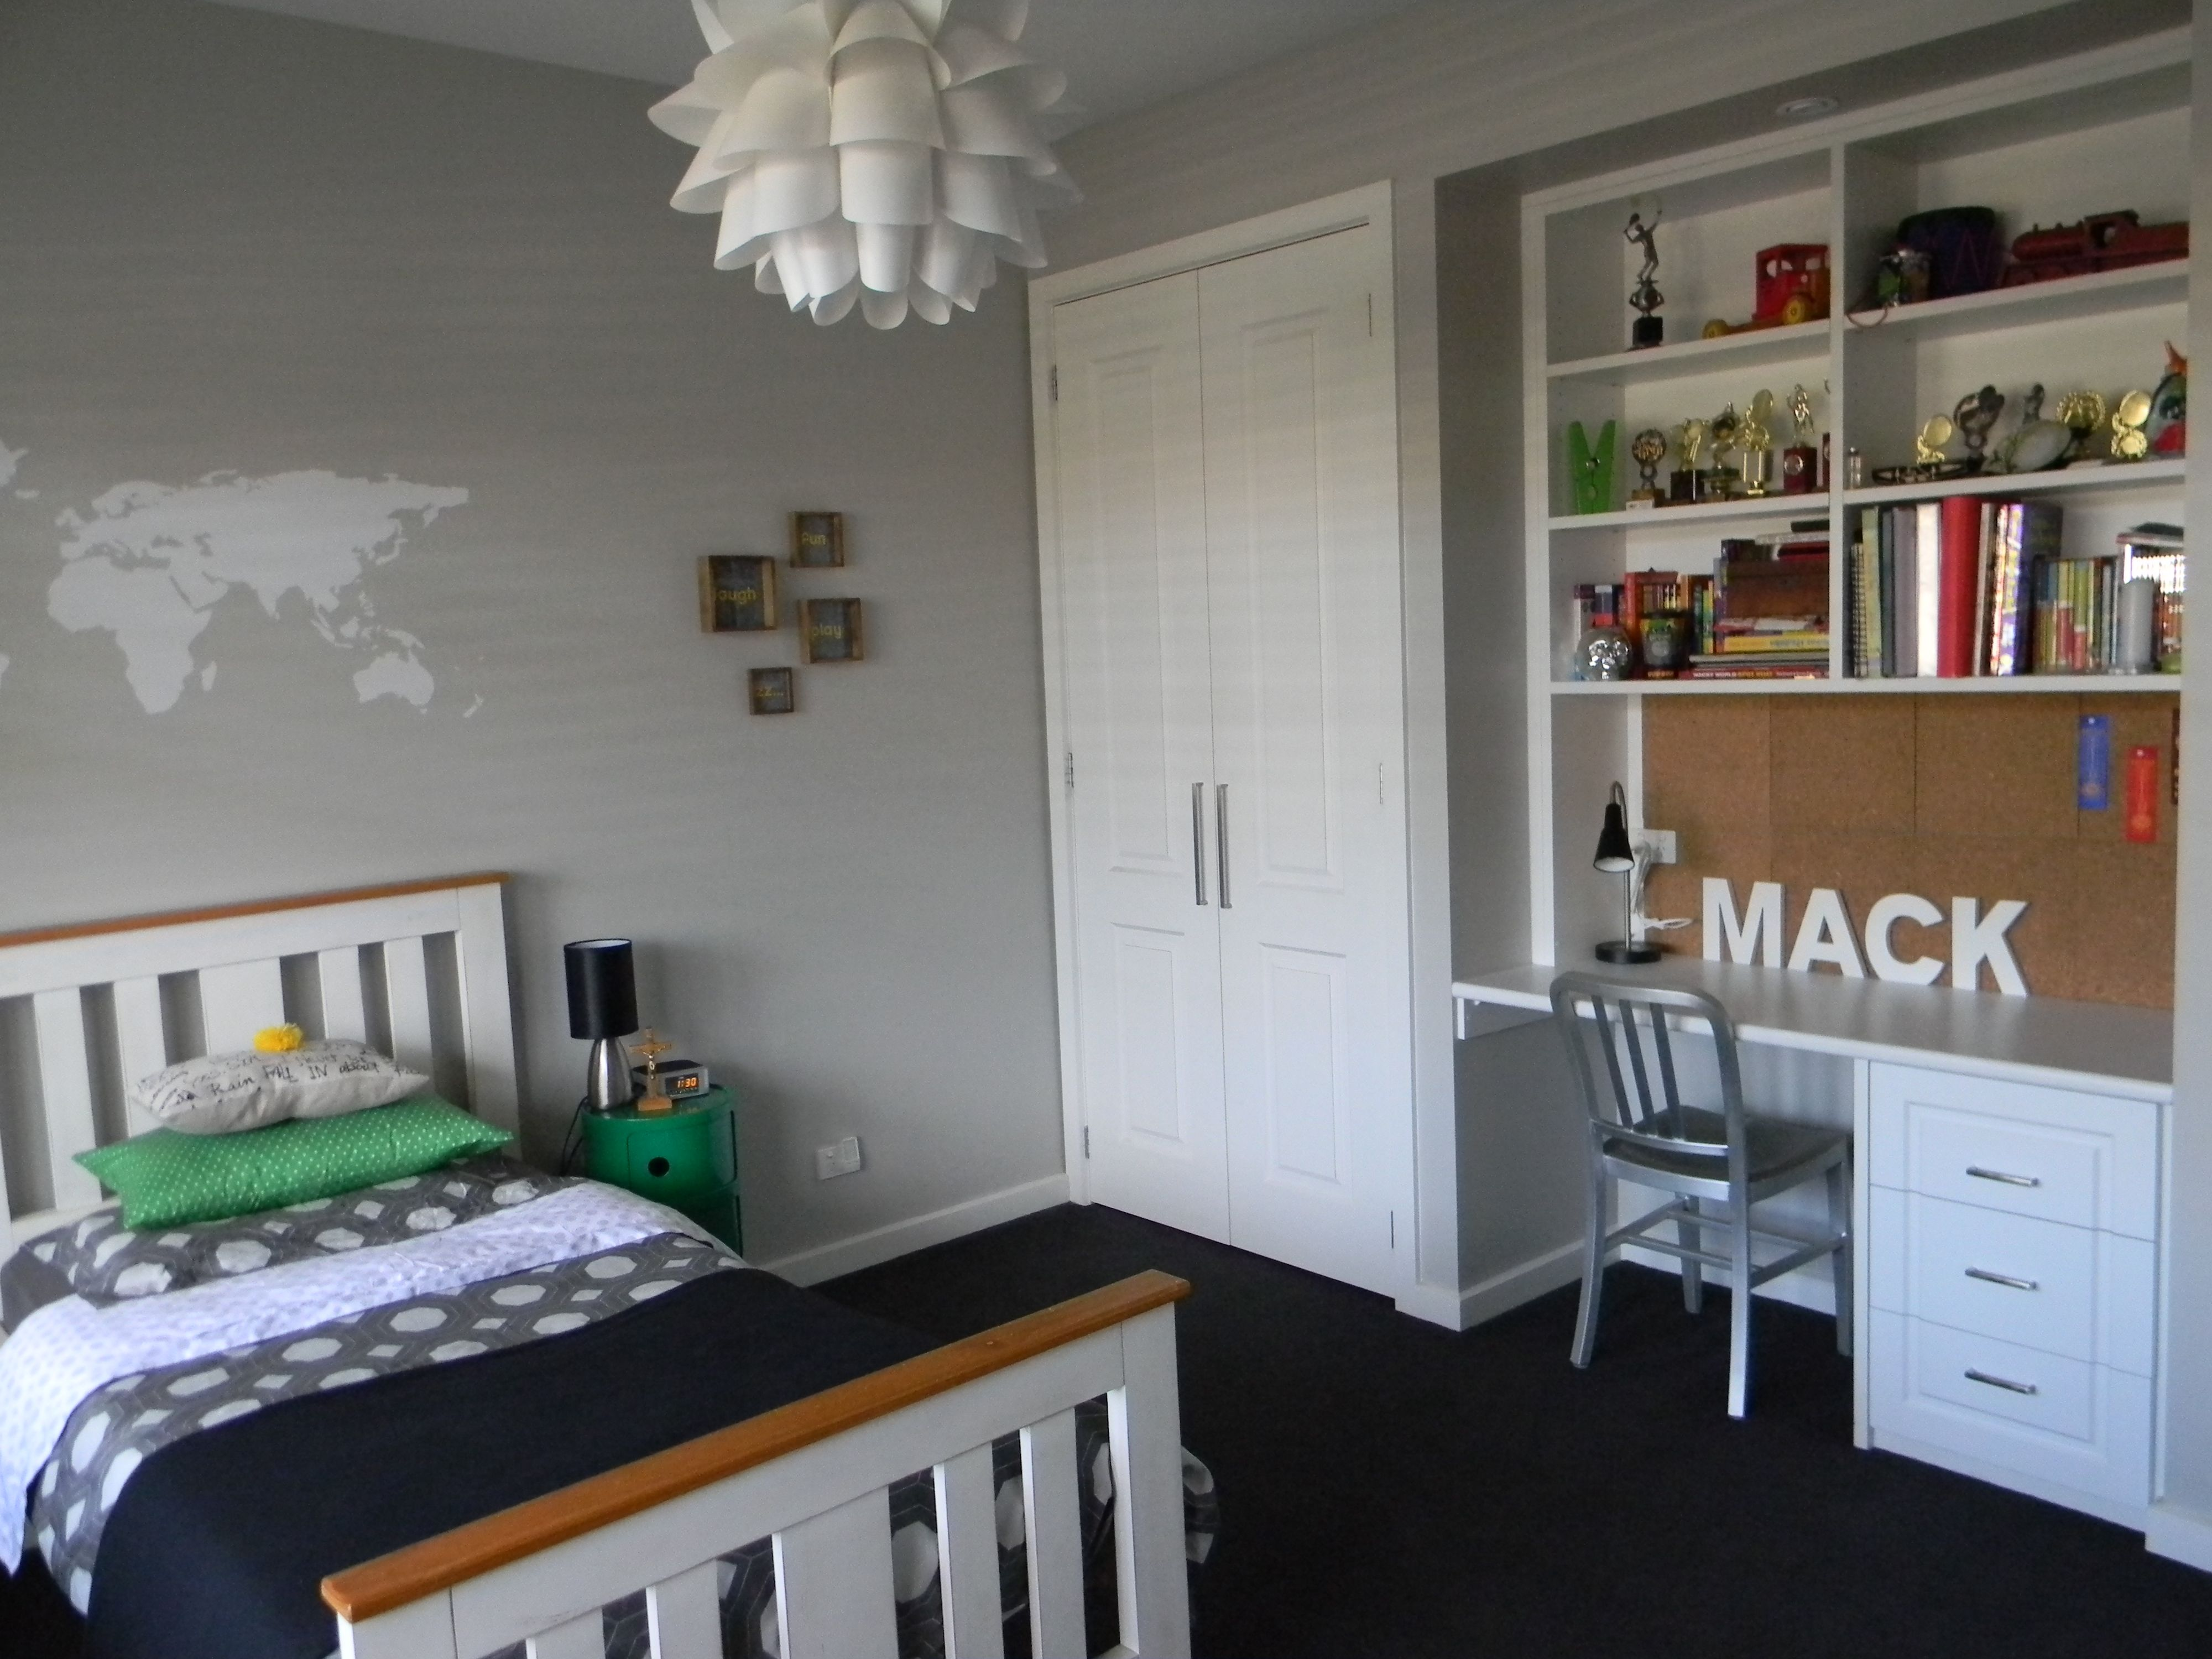 Boys Bedroom Bedroom Built Ins Shelves In Bedroom Small Bedroom Colours